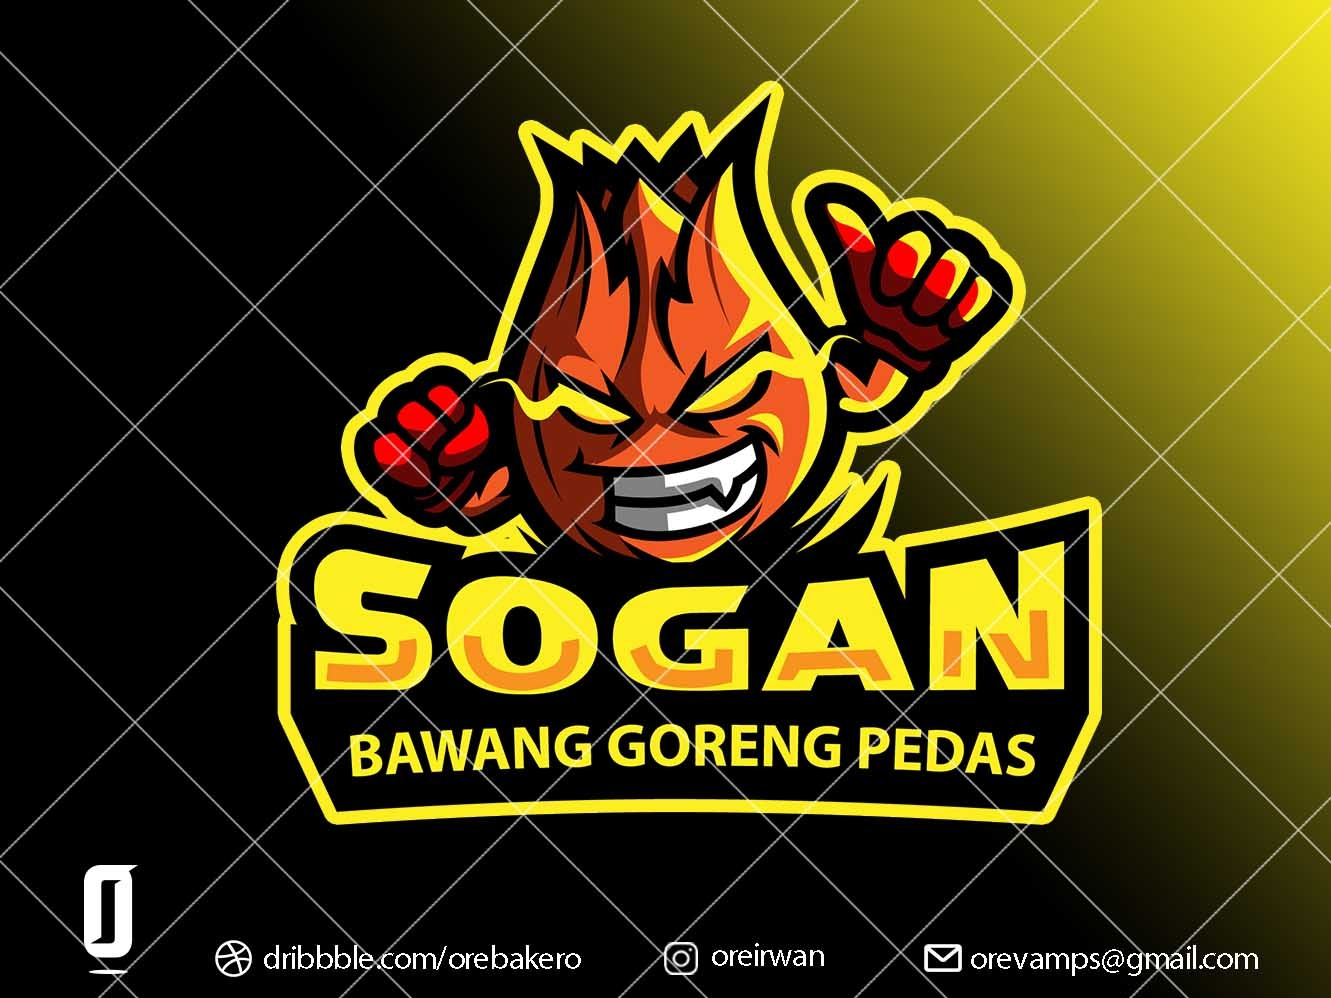 Sogan teamlogo graphicdesign graphicdesigner logodesign esports logo mascot logo branding mascotdesign logomascot illustration design